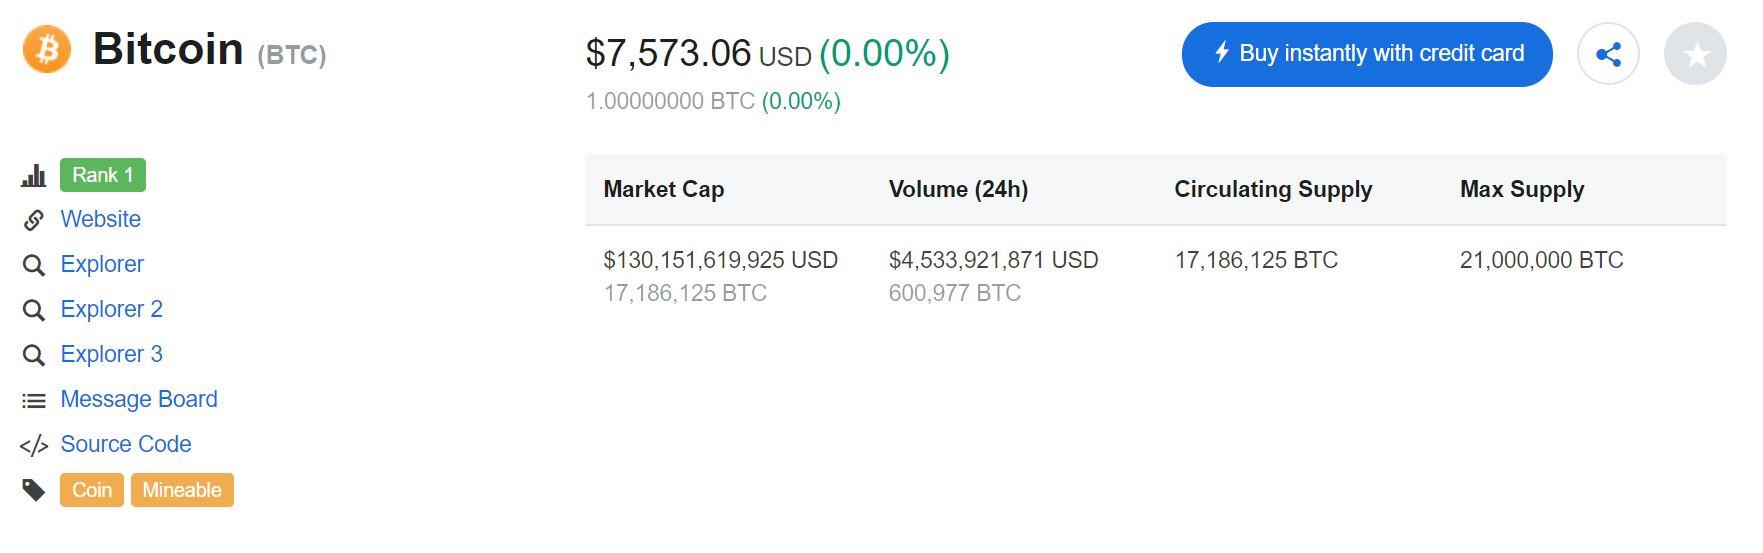 Bitcoin Staves Off Drop Under $7,500, Investors Remain Bullish 1